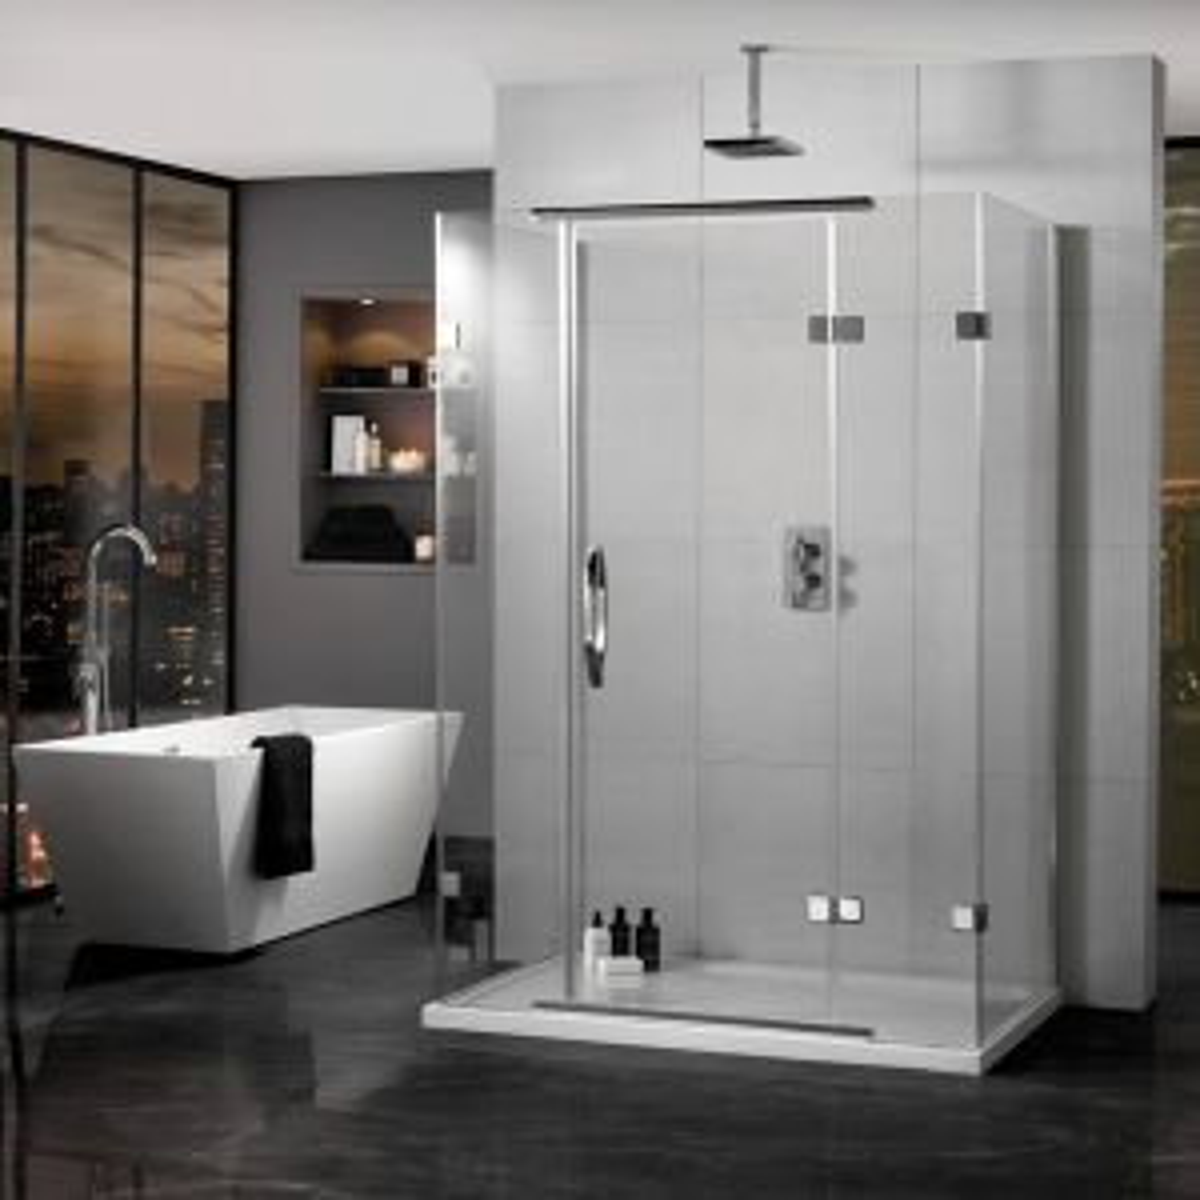 Aquadart Inline Hinged 3 Sided Shower Enclosure